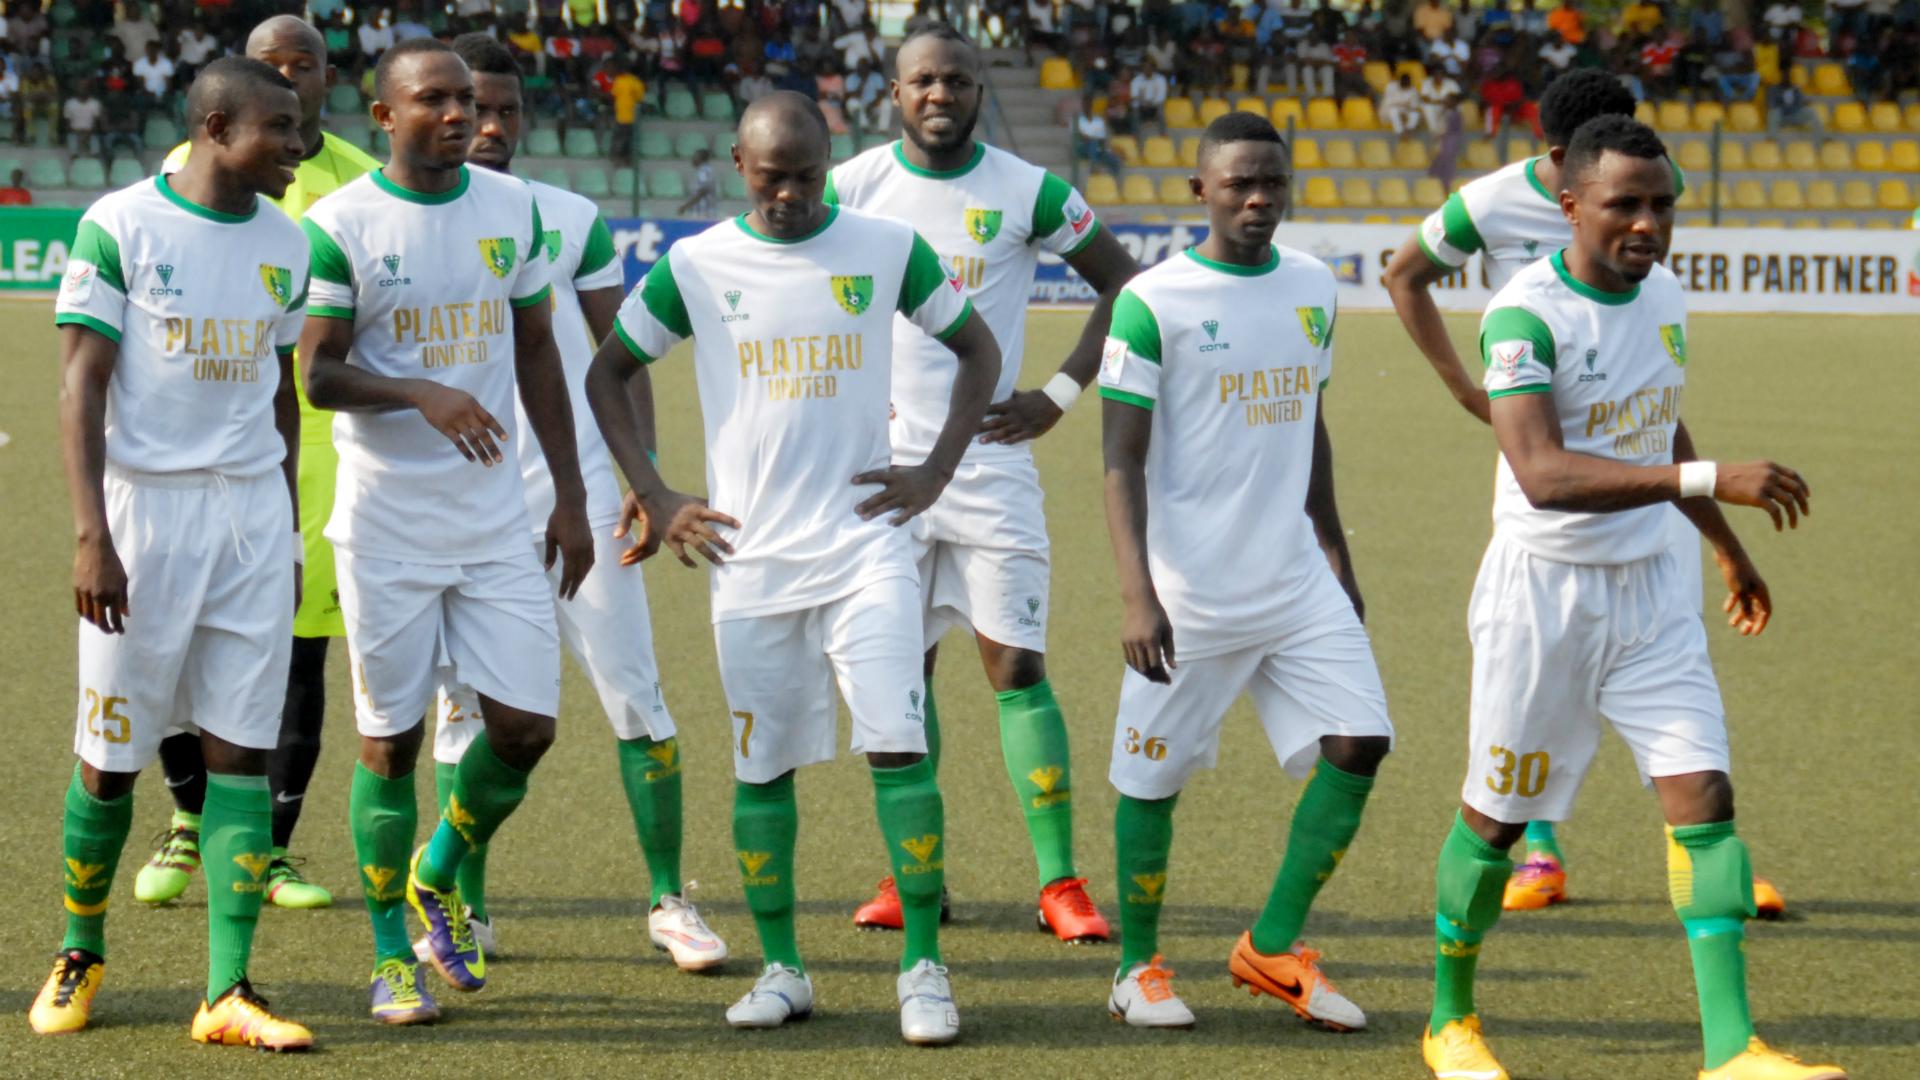 NPFL Wrap: Plateau United return to summit after Adamawa United demolition